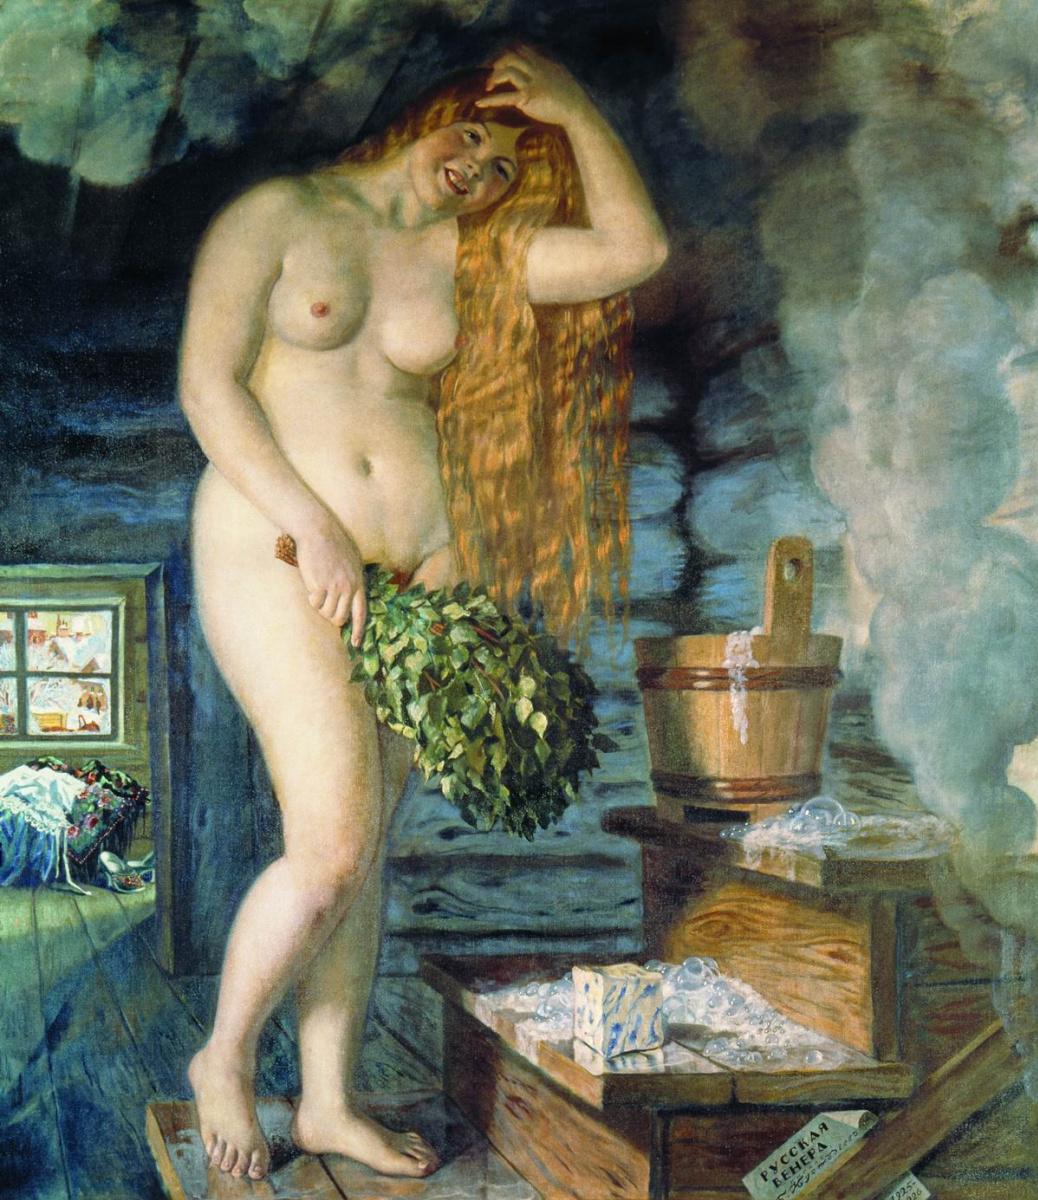 nude-russian-work-marilyn-monroe-naked-dude